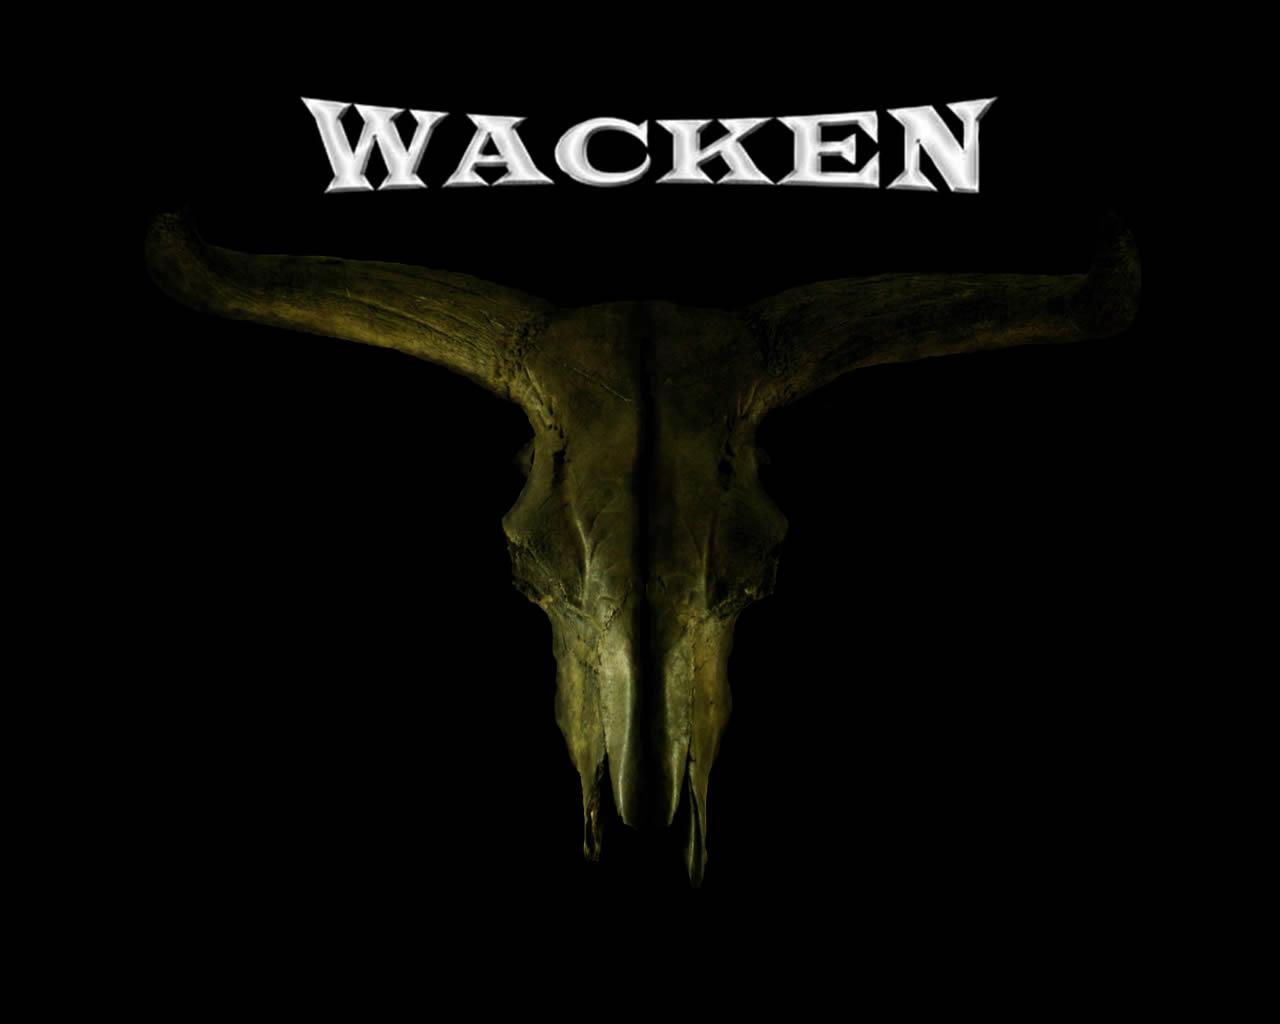 Extraoficialmente WACKEN ROCKS en Latinoamerica 2012